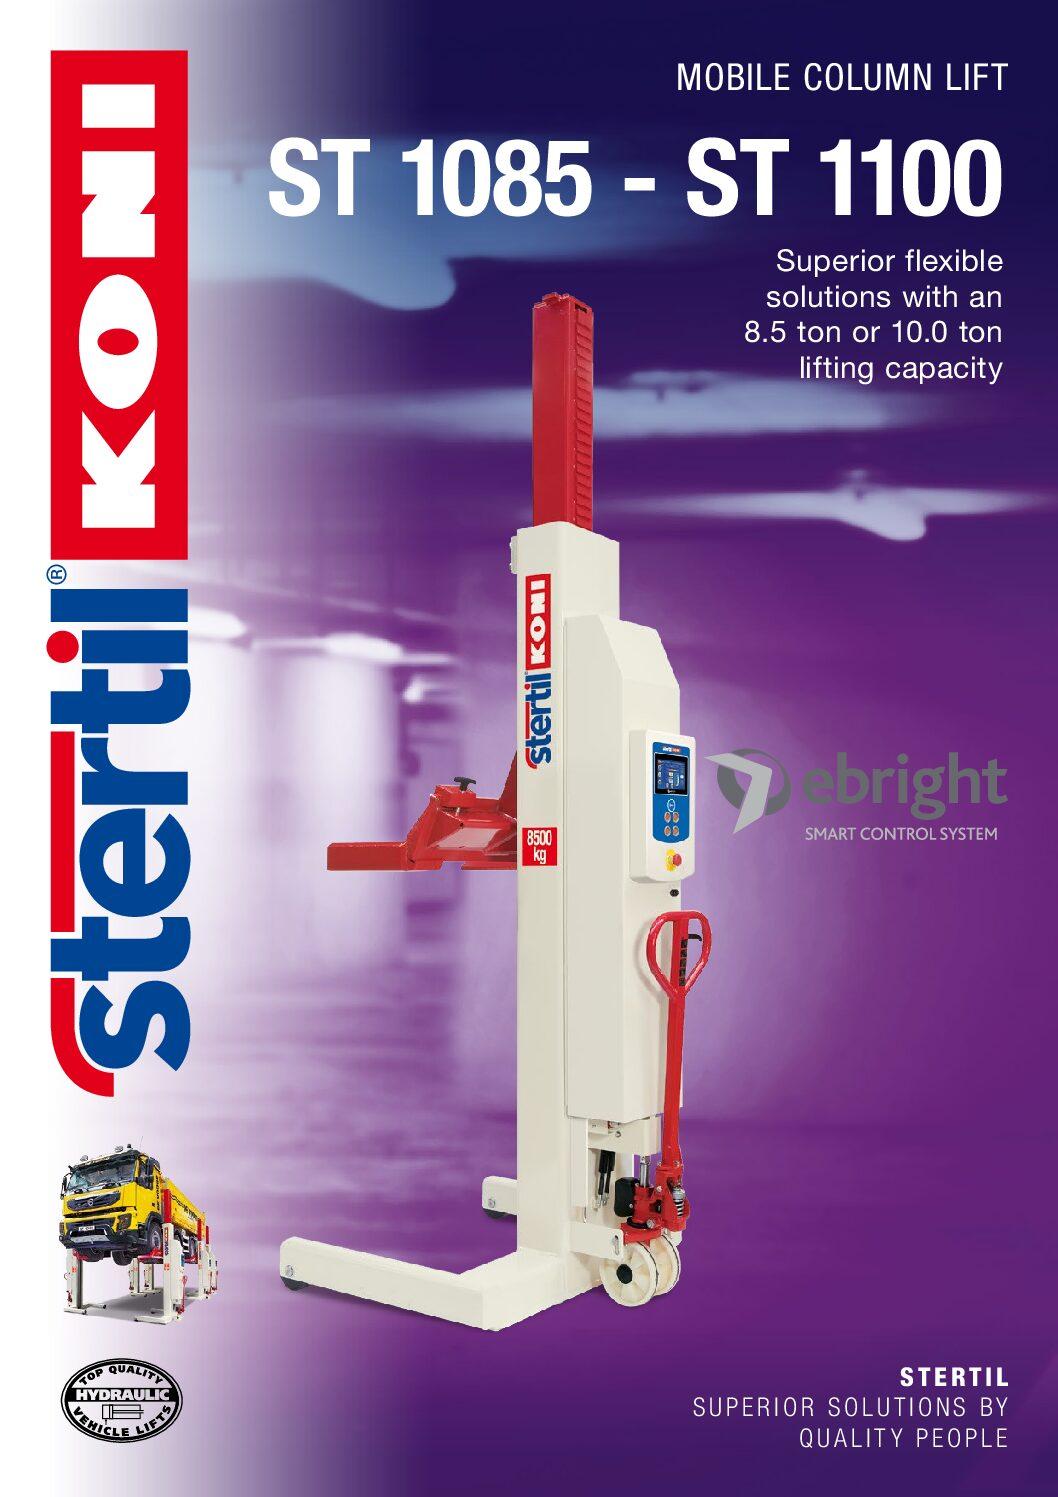 Stertil-Koni: ST 1085 – ST 1100 – GB Version